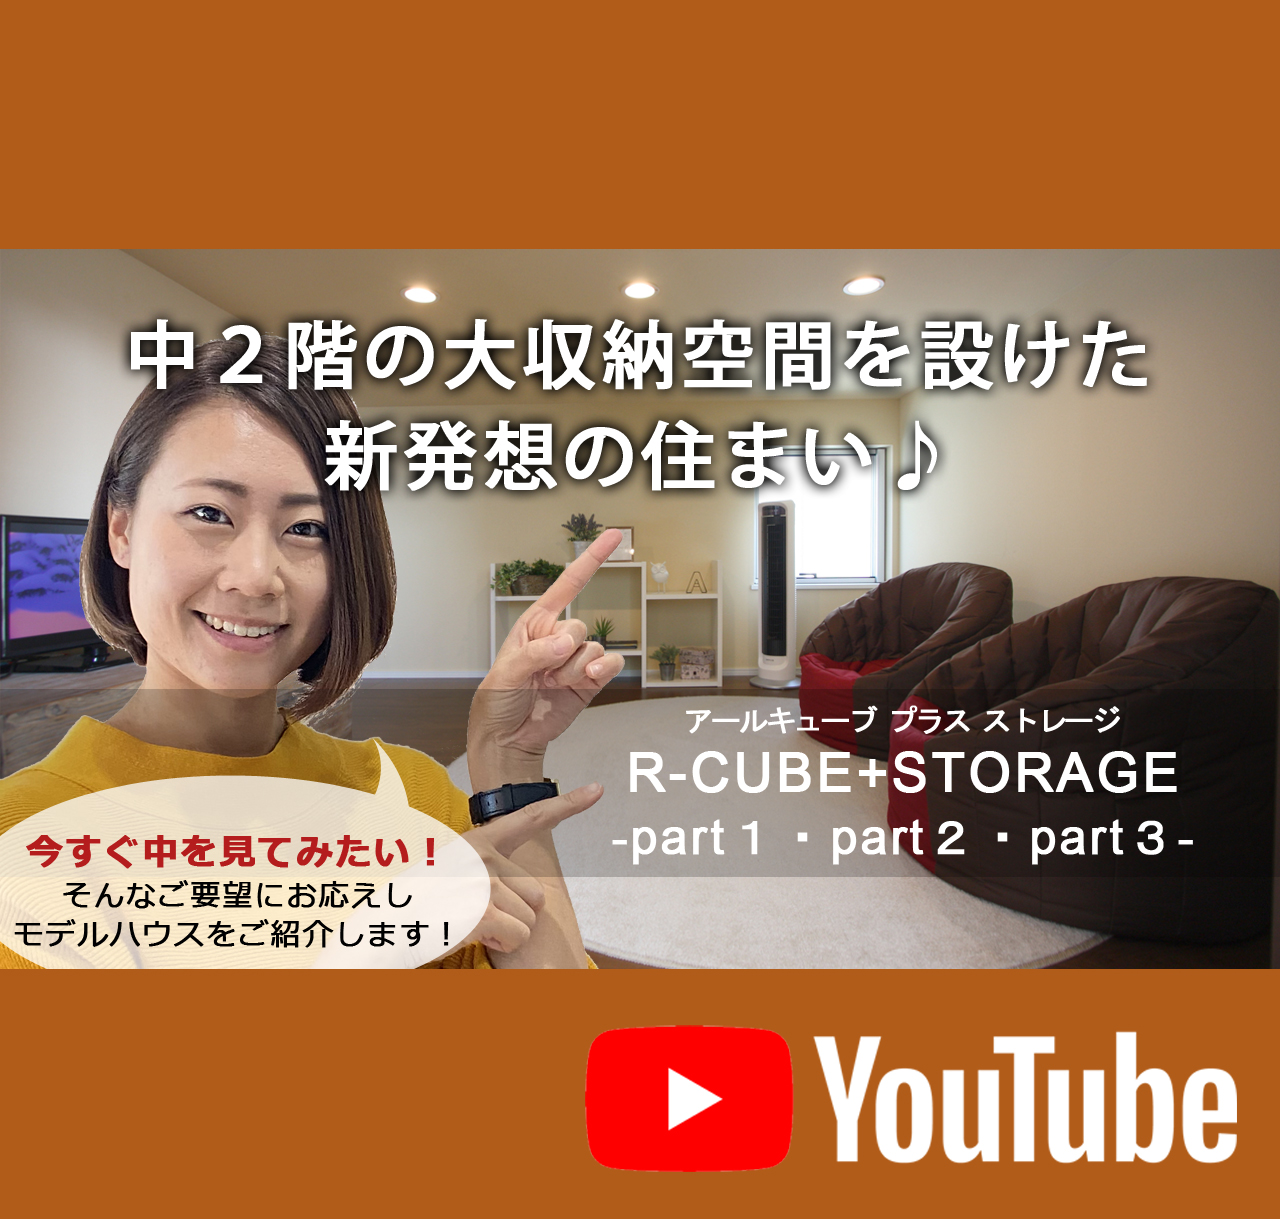 Youtube限定!WEB見学会 R-CUBE+MEZZANINE